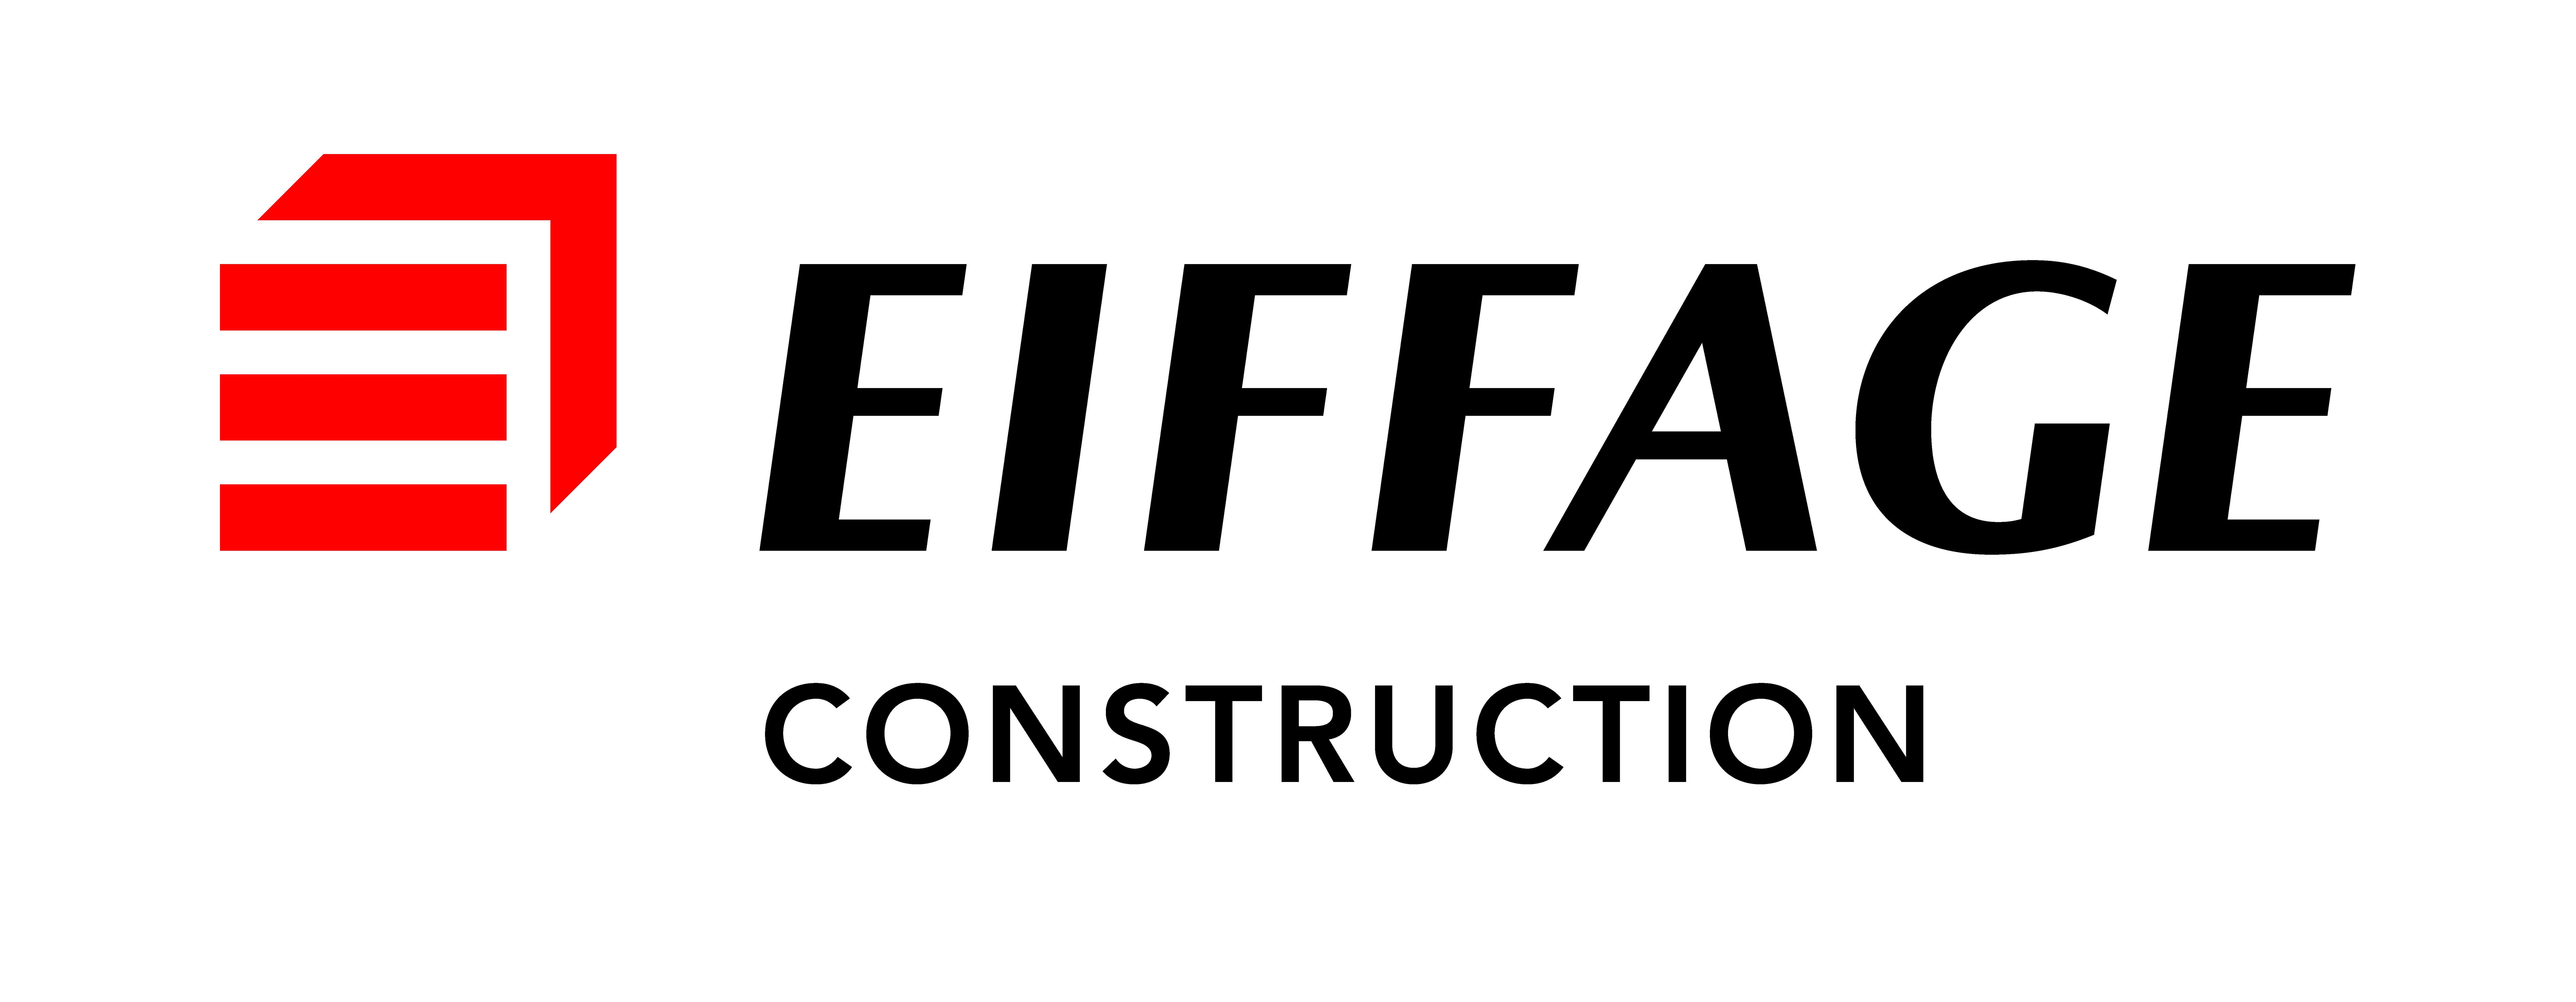 Eiffage Construction Logo